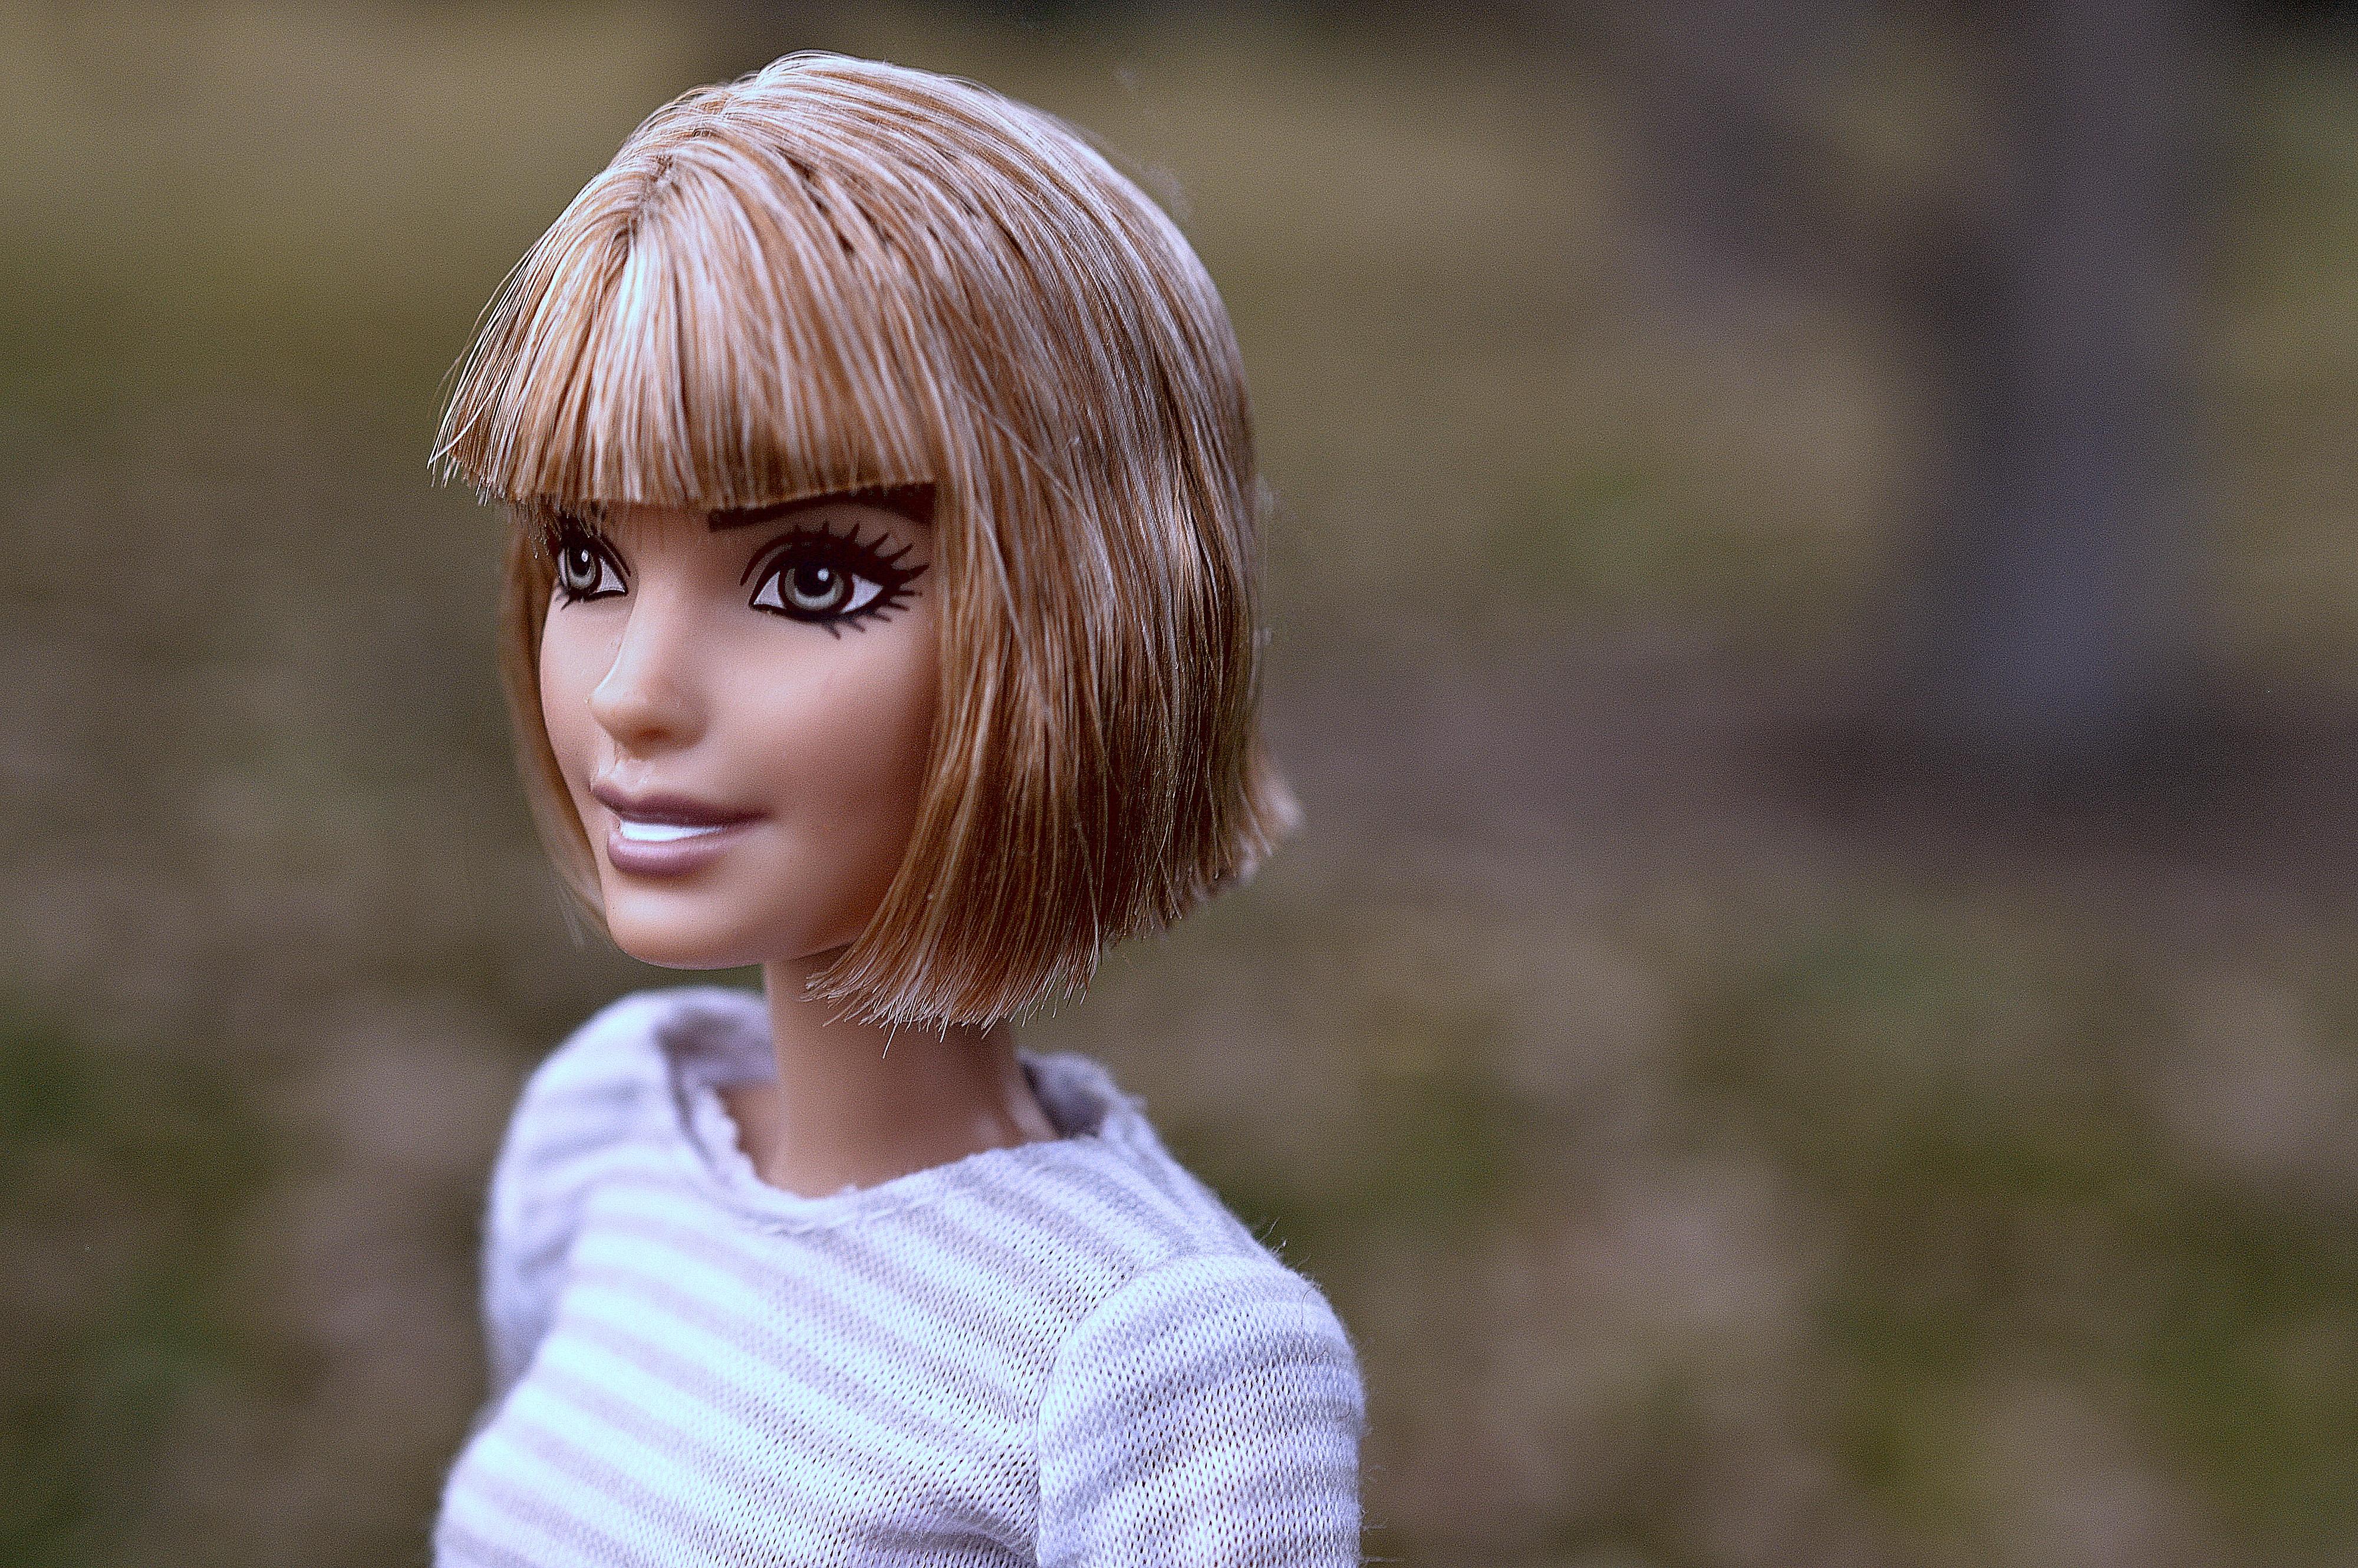 Free Images Girl Looking Female Model Fashion Clothing Toy